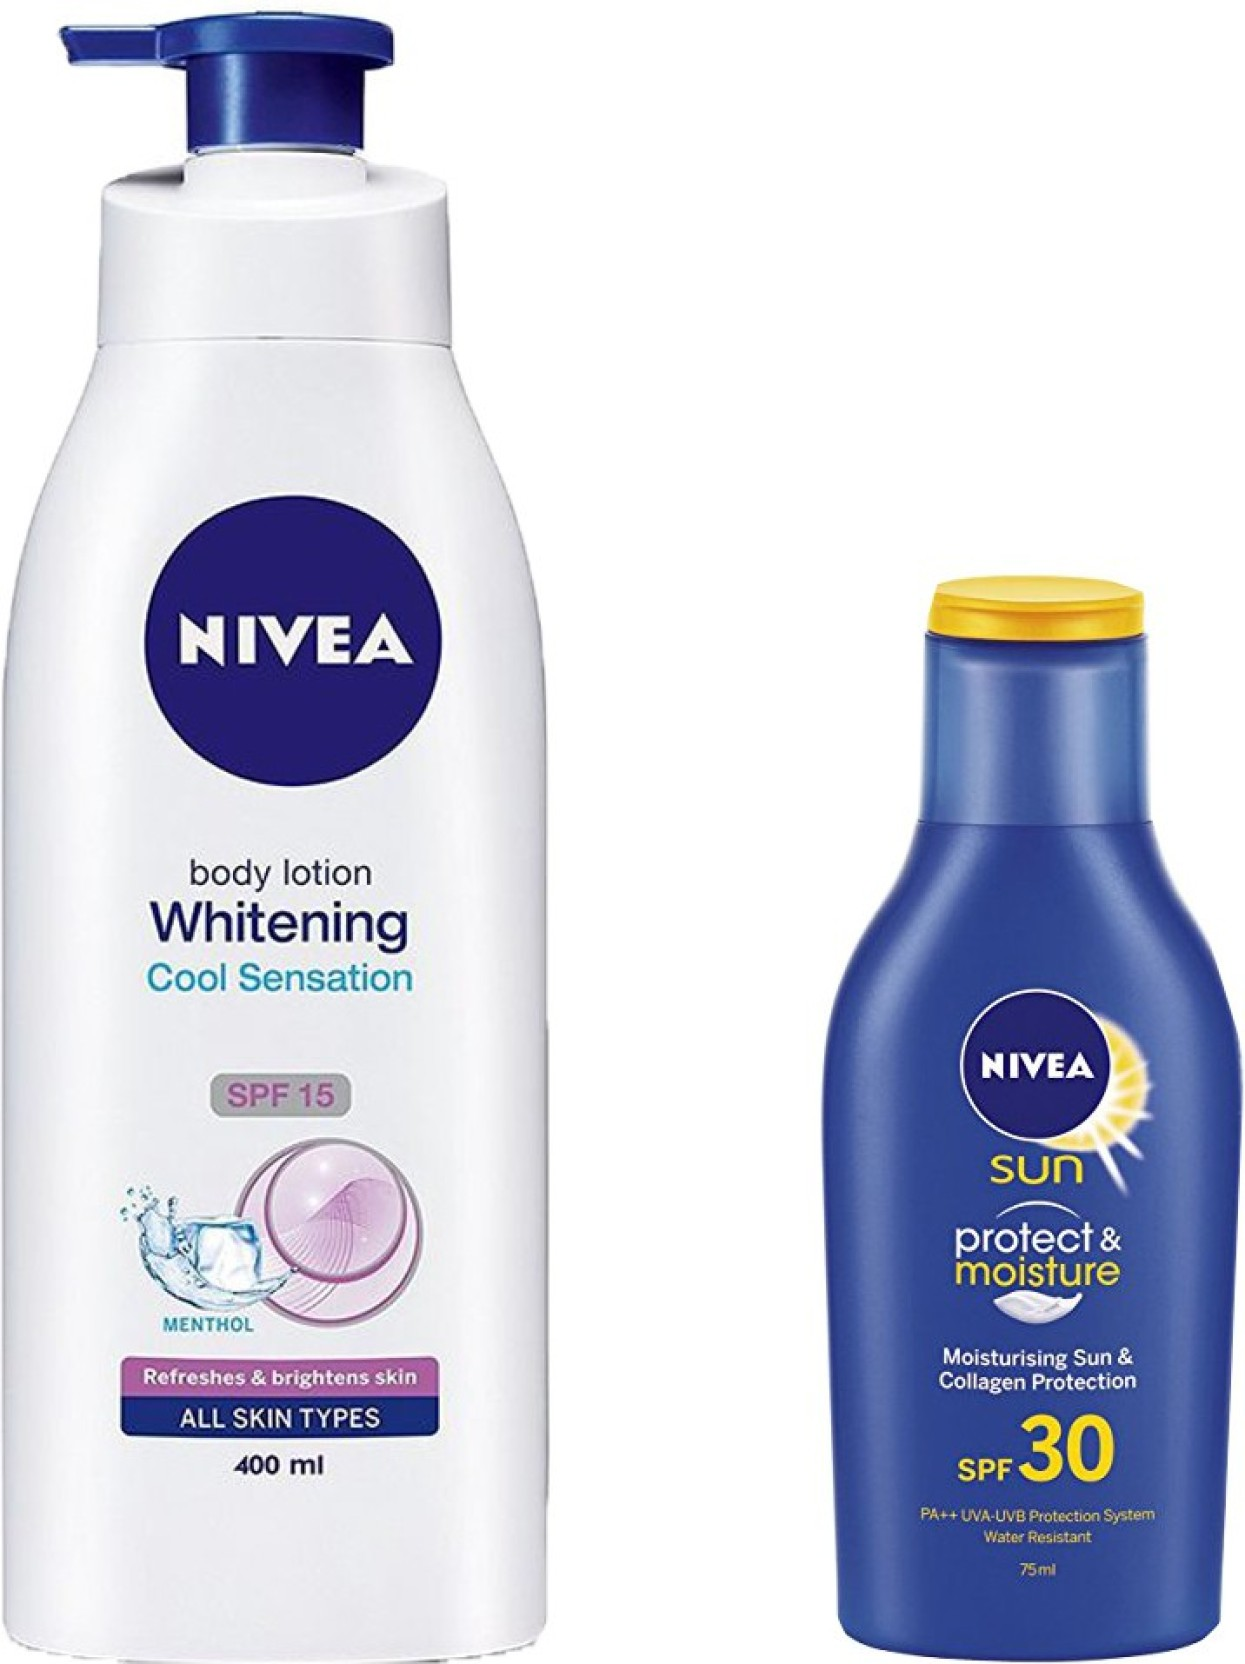 Nivea Whitening Cool Sensation Spf 15 Body Lotion 400 Ml Sun Protect Add To Cart